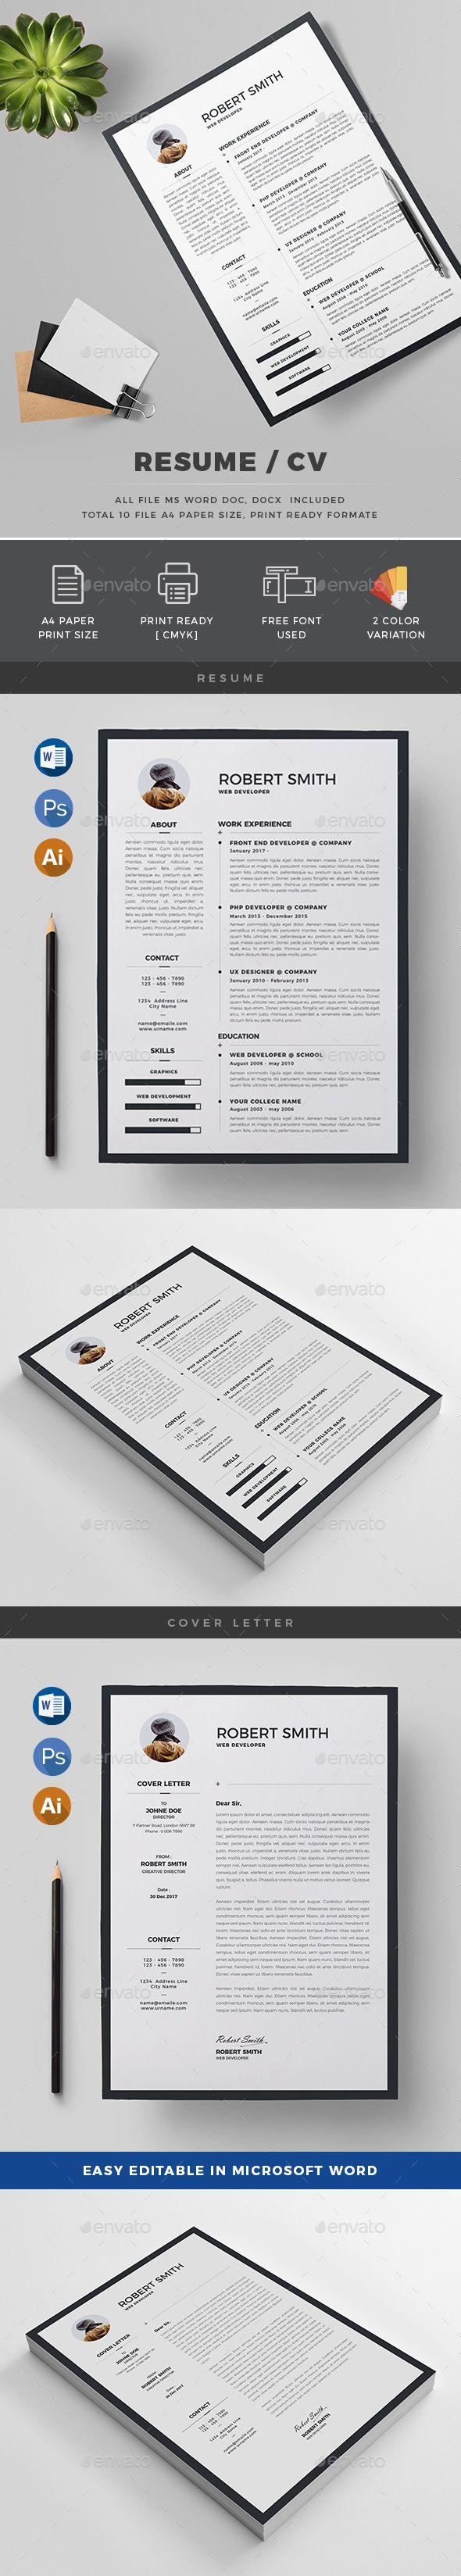 Resume Resume design template, Resume cv, Simple resume